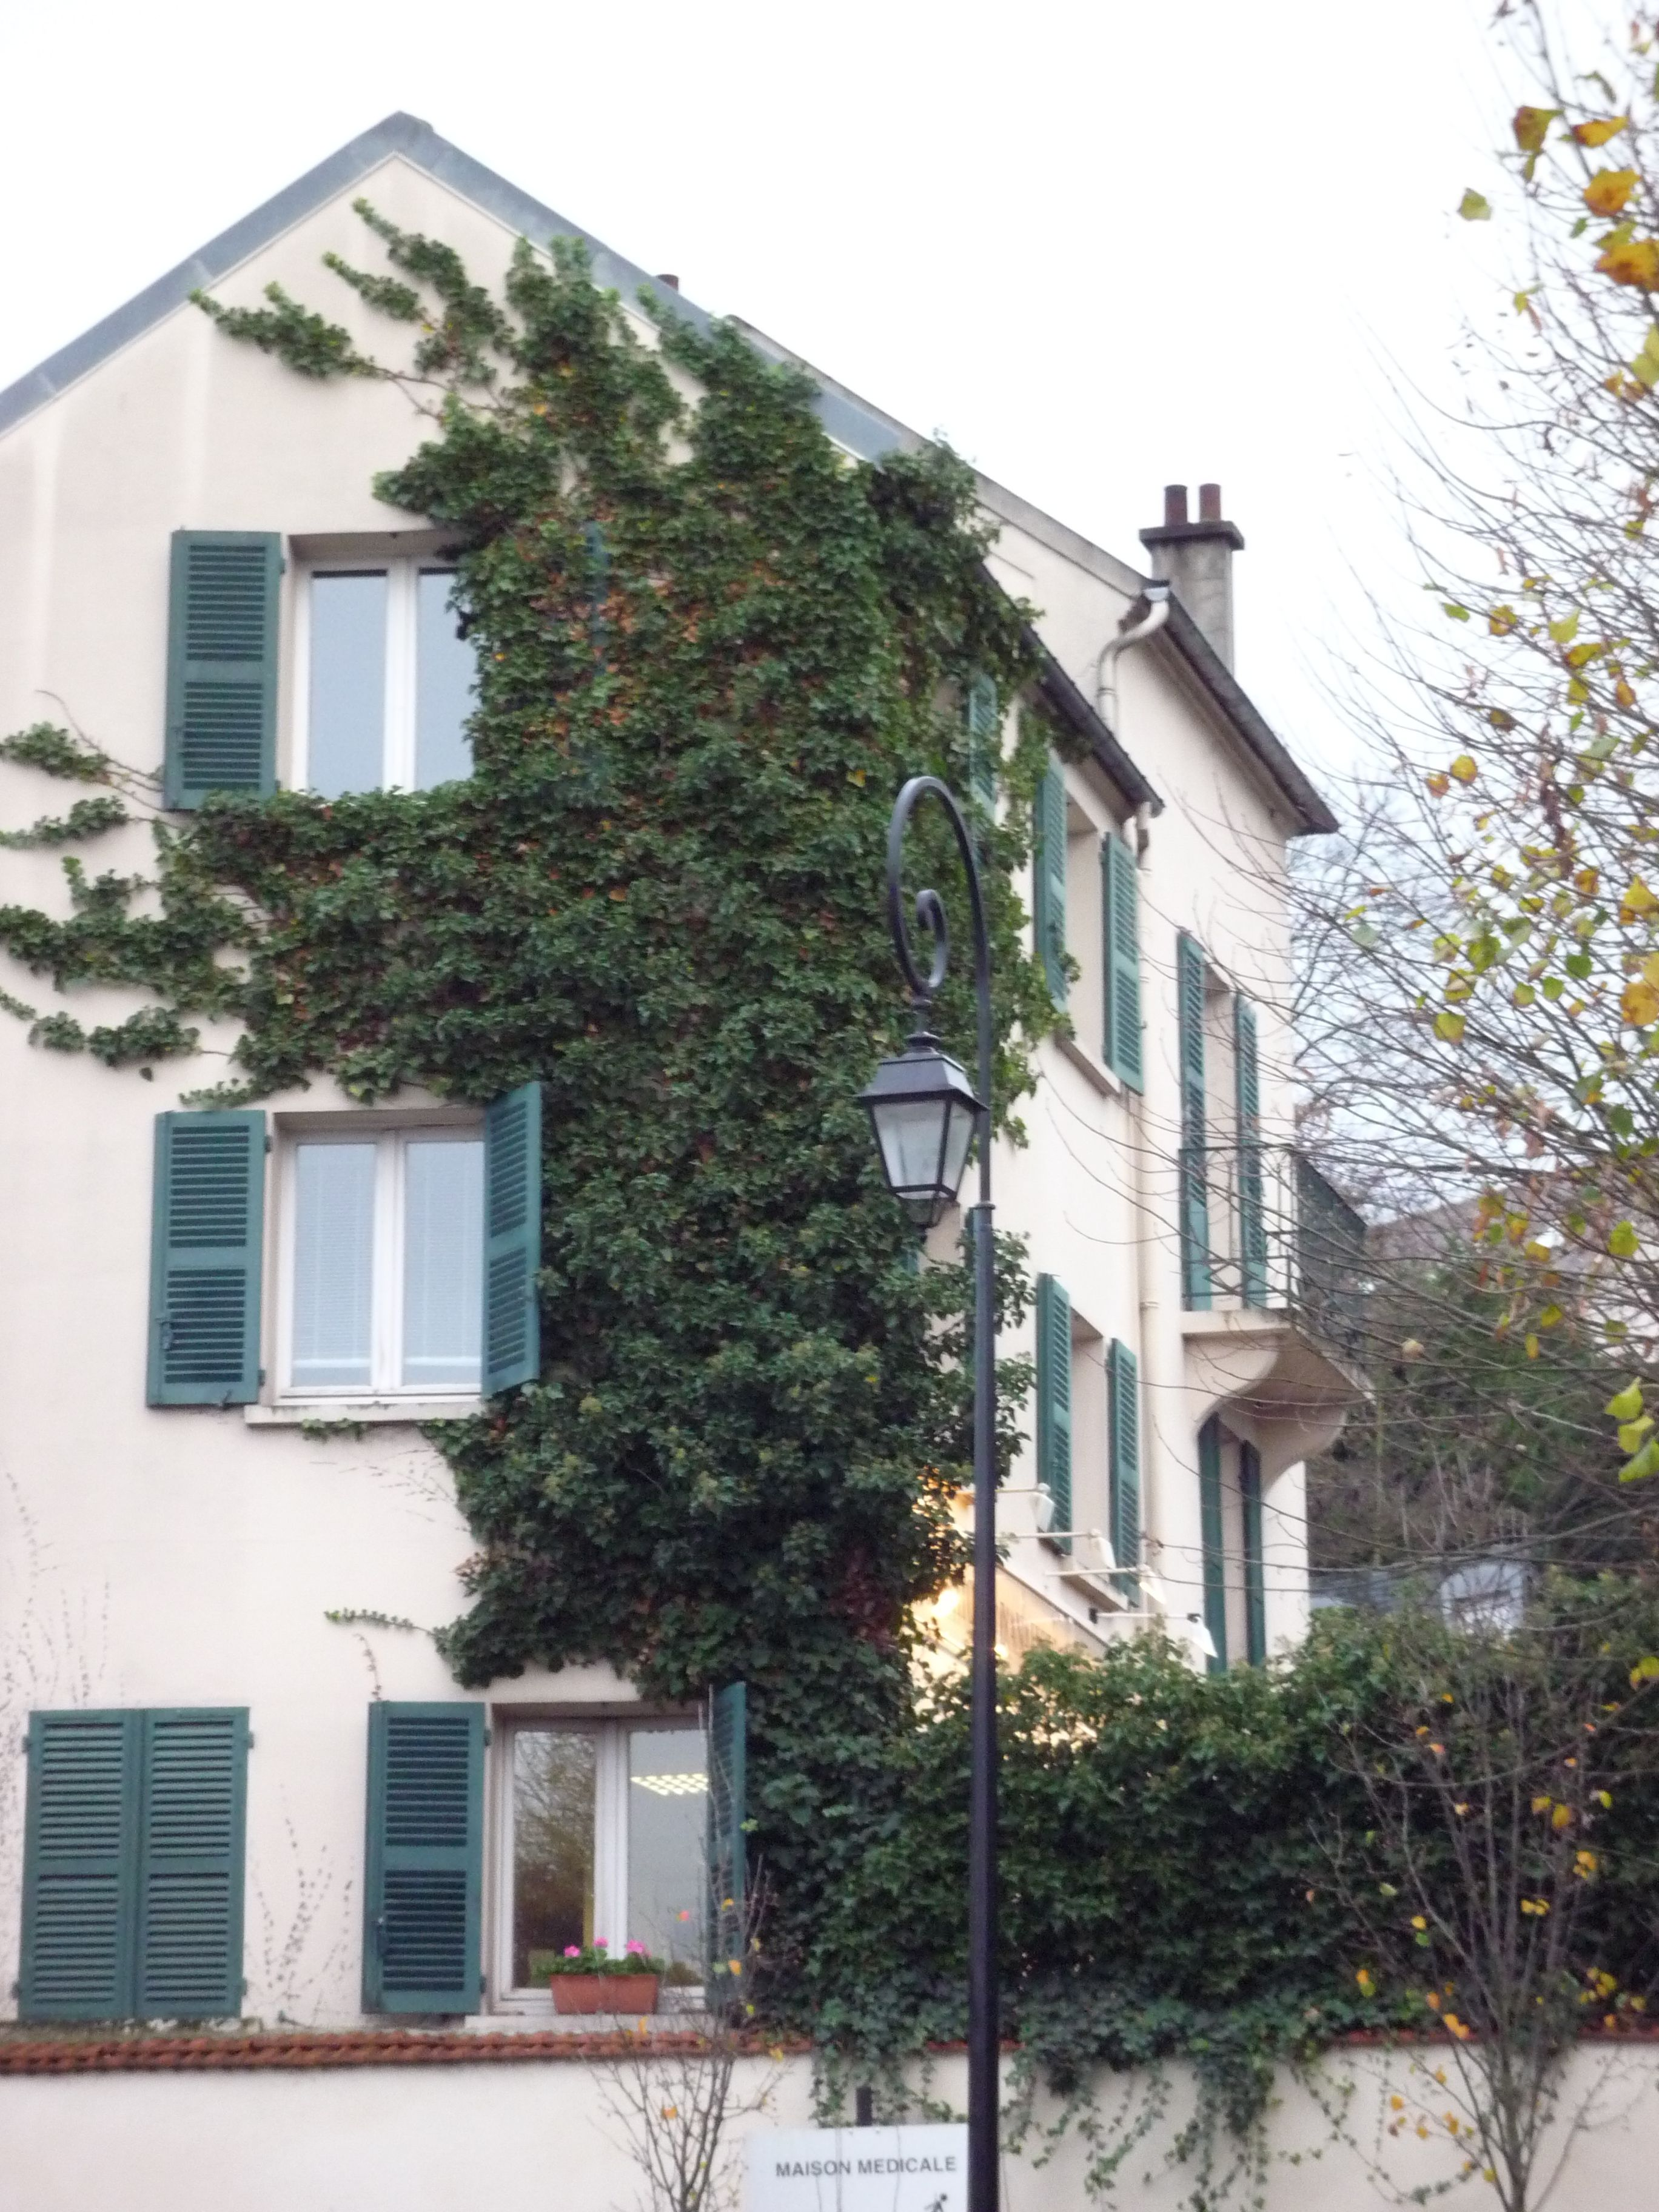 Berthe Morisot (1841-1895) a vécu à Bougival (Isla de Francia, Francia) - http://www.tourisme-bougival.com/visiter-bougival/maison-de-berthe-morisot/